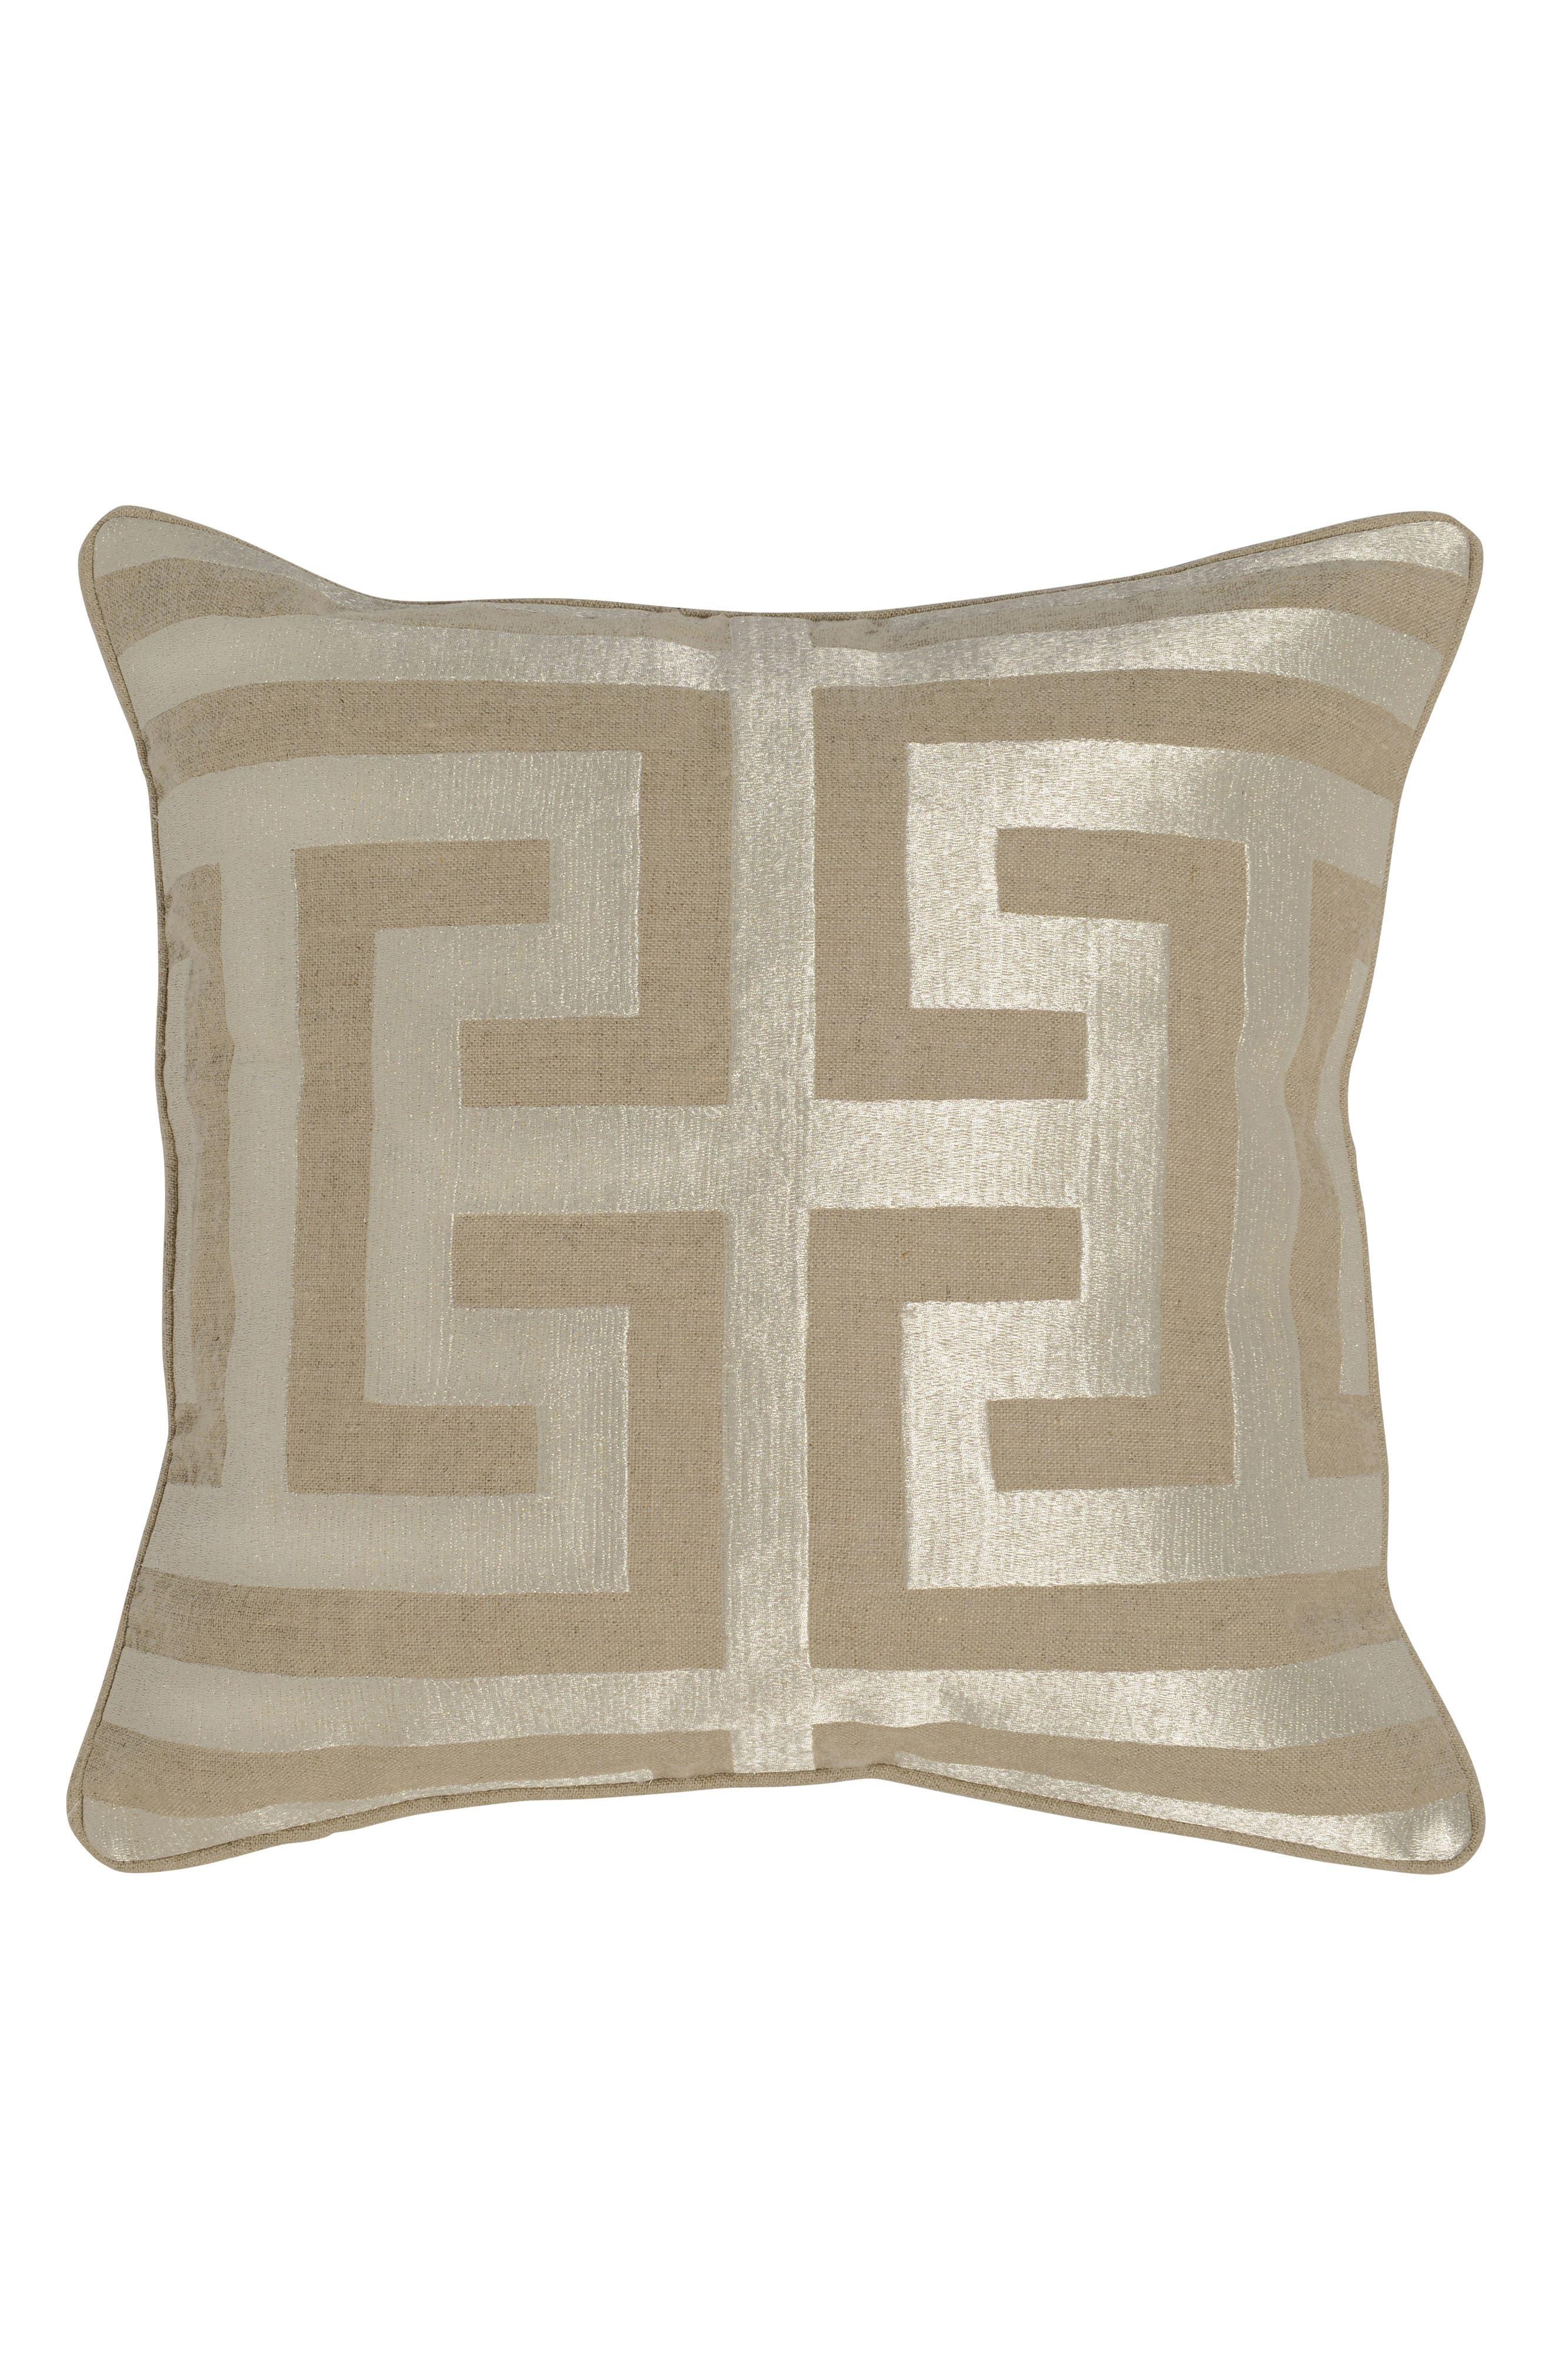 VILLA HOME COLLECTION,                             'Capital' Decorative Pillow,                             Main thumbnail 1, color,                             250